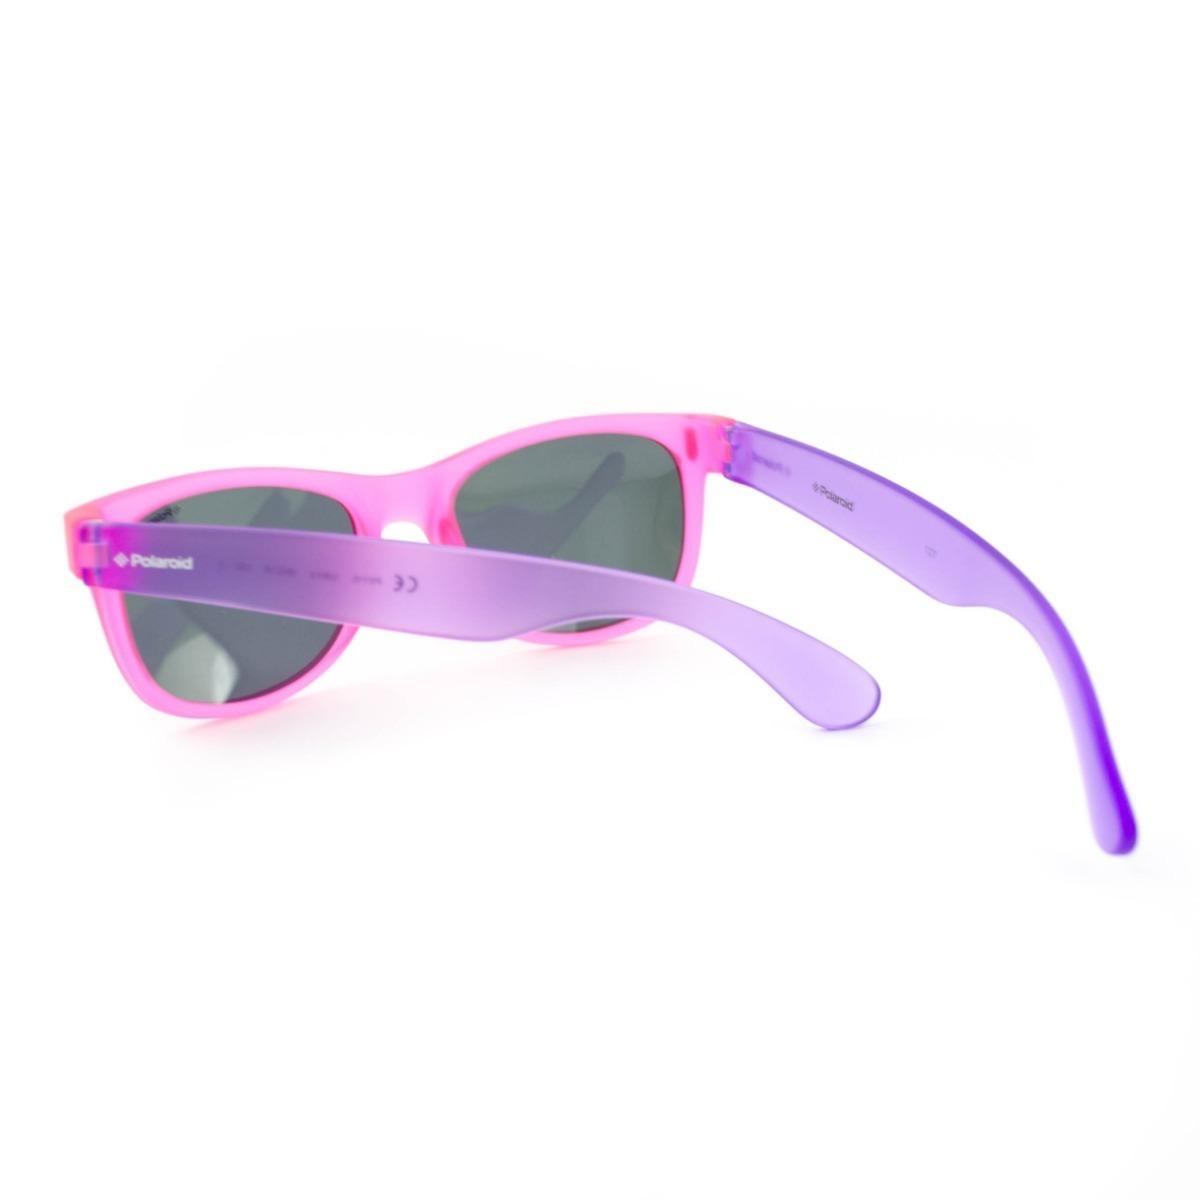 óculos de sol infantil polaroid kids - p0115 iuby2 - rosa. Carregando zoom. e74df3b613